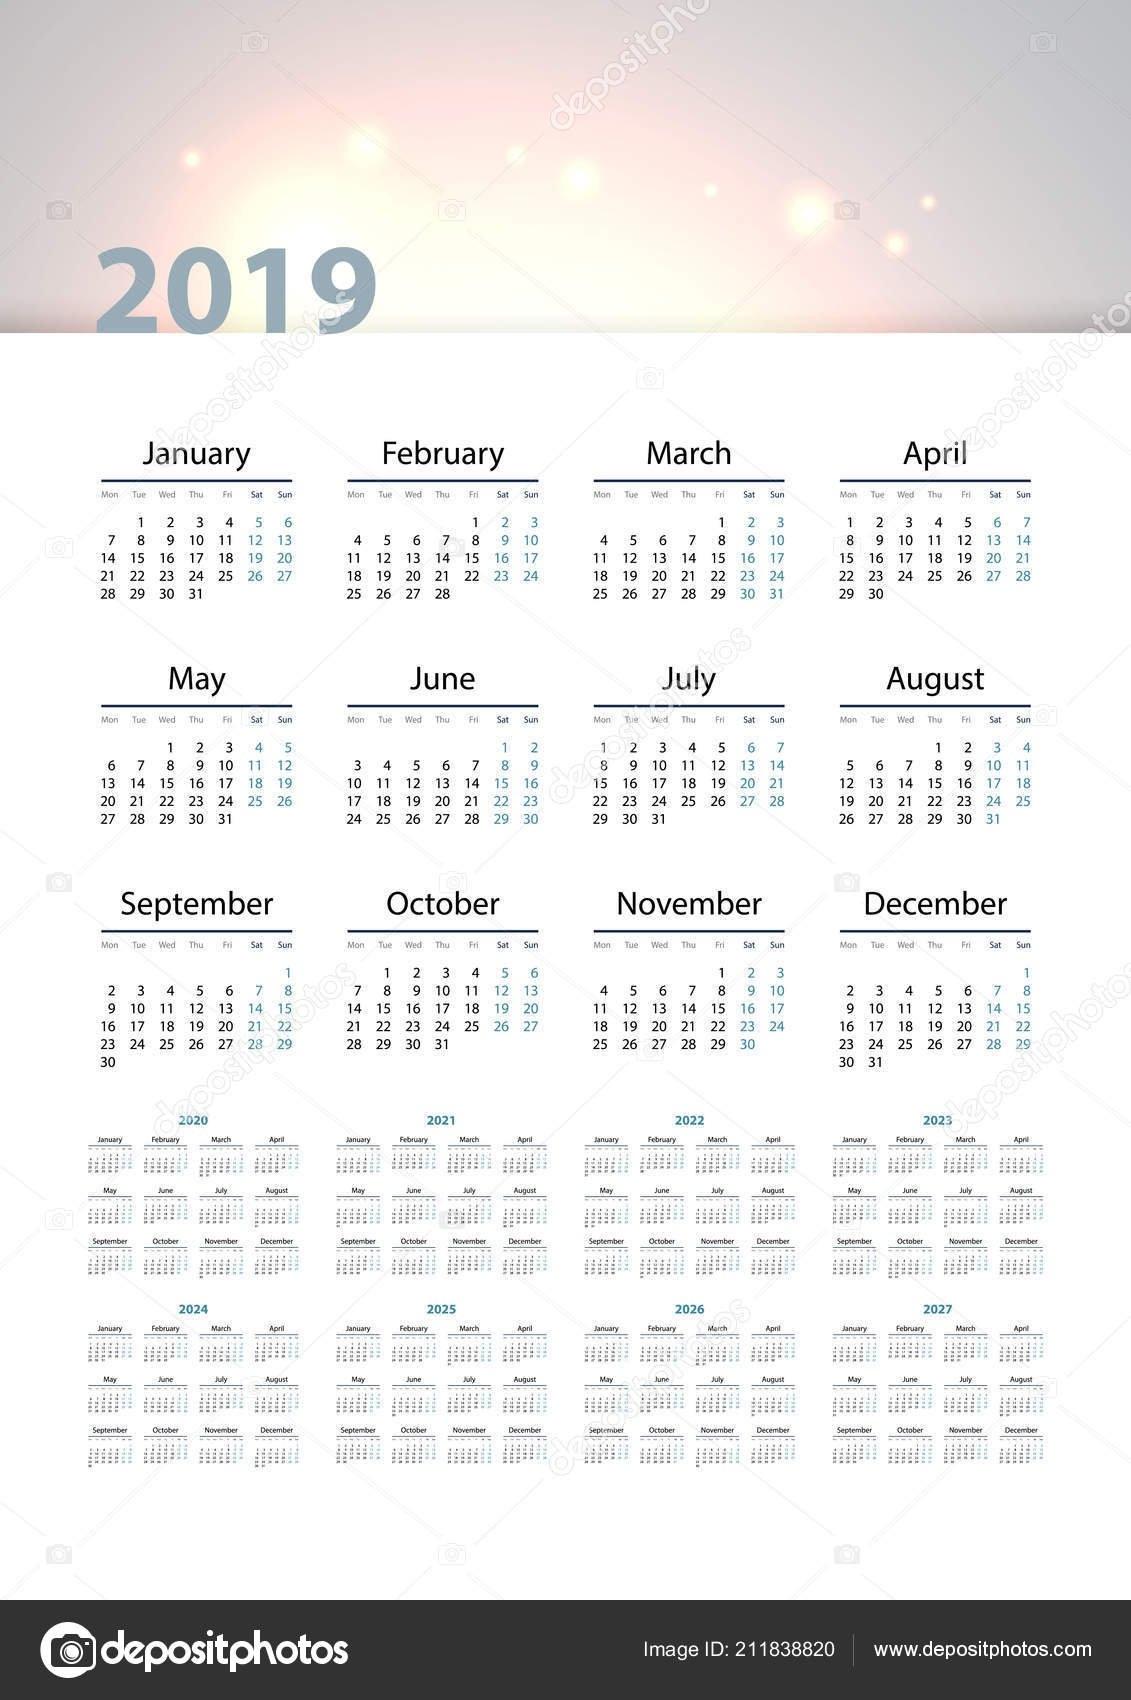 Calendar 2019 2020 2021 2022 2023 2024 2025 2026 2027 — Stock Vector © Tashechka #211838820 in Calender 2021 To 2025